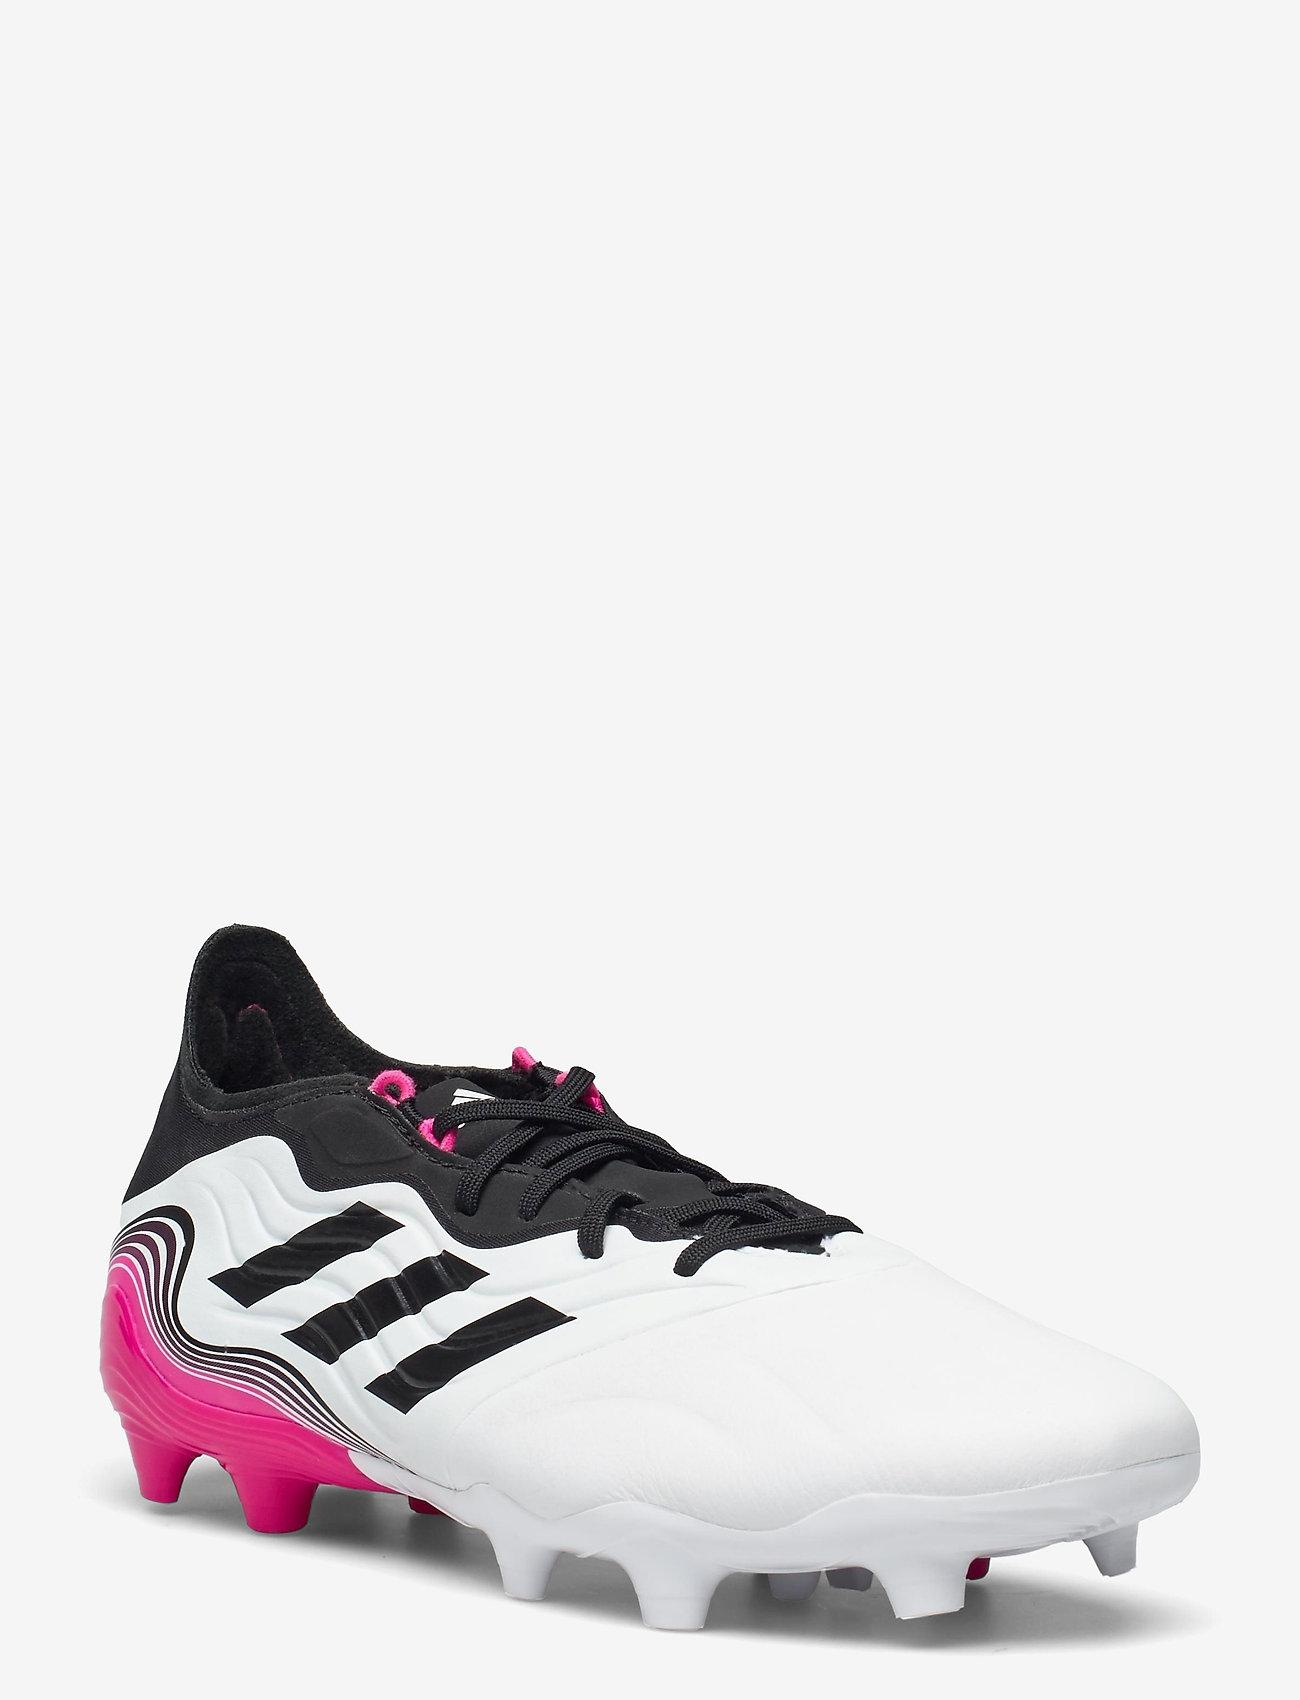 adidas Performance - Copa Sense.2 Firm-Ground Boots - fodboldsko - ftwwht/cblack/shopnk - 0